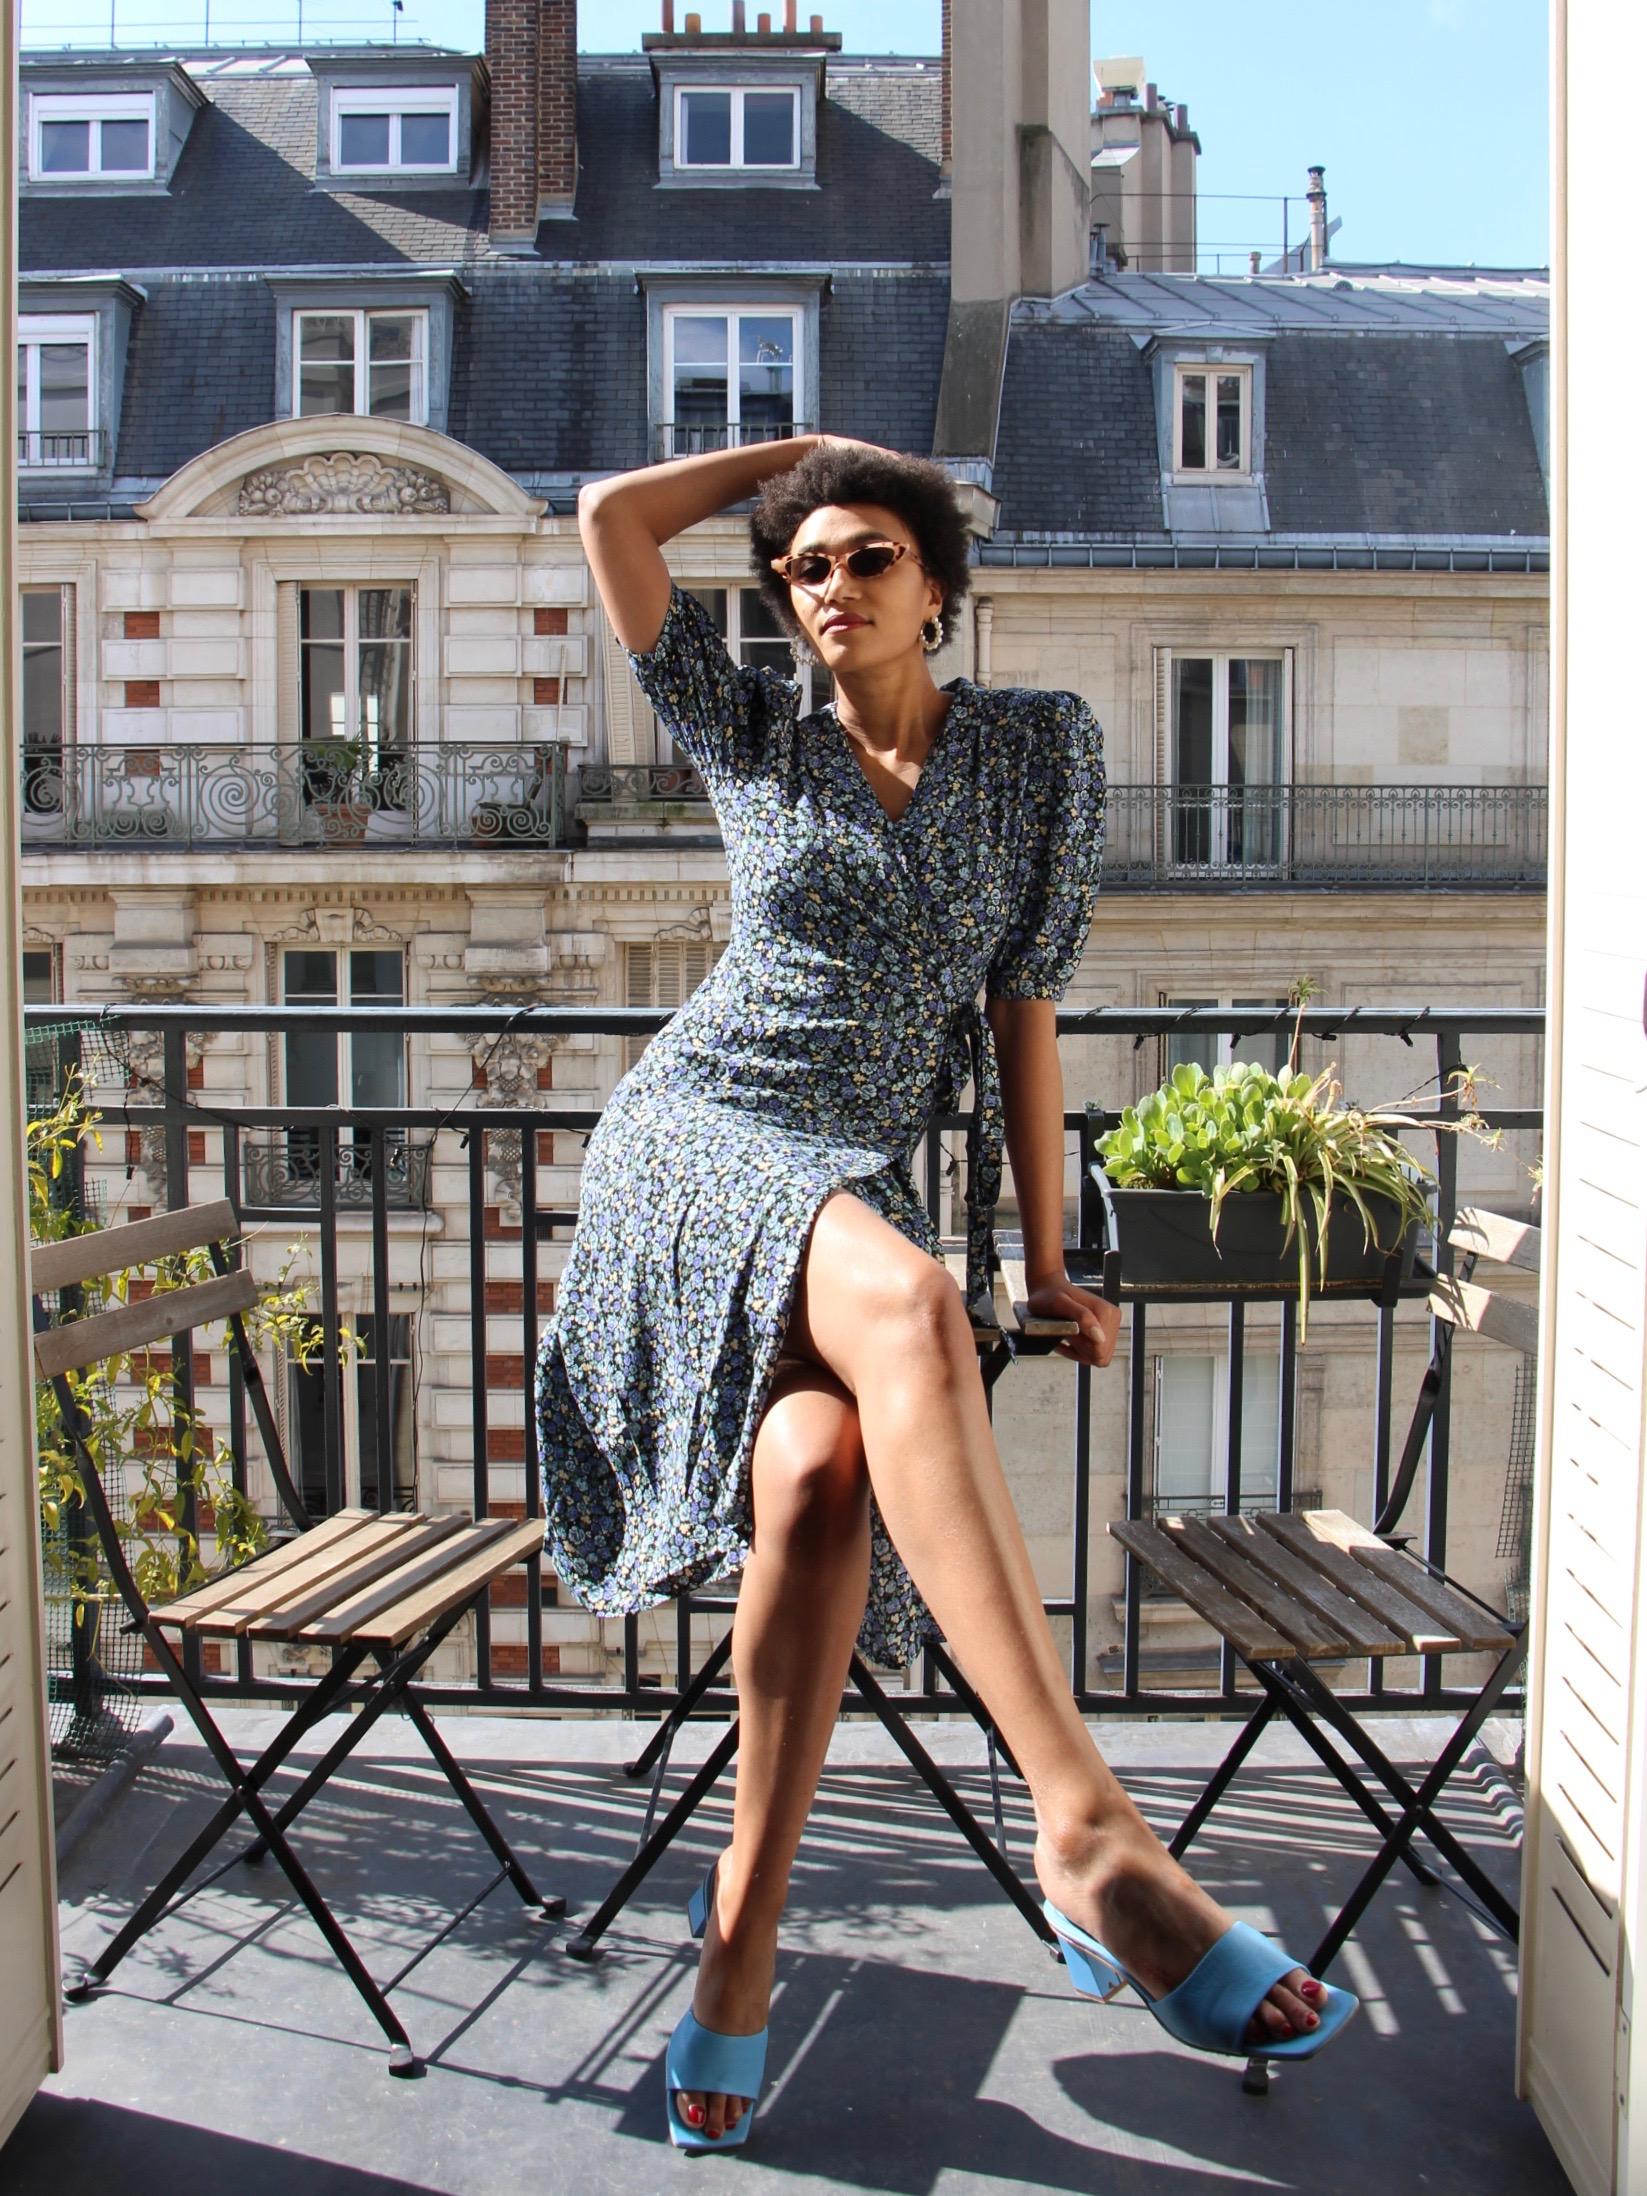 Parisienne fashion